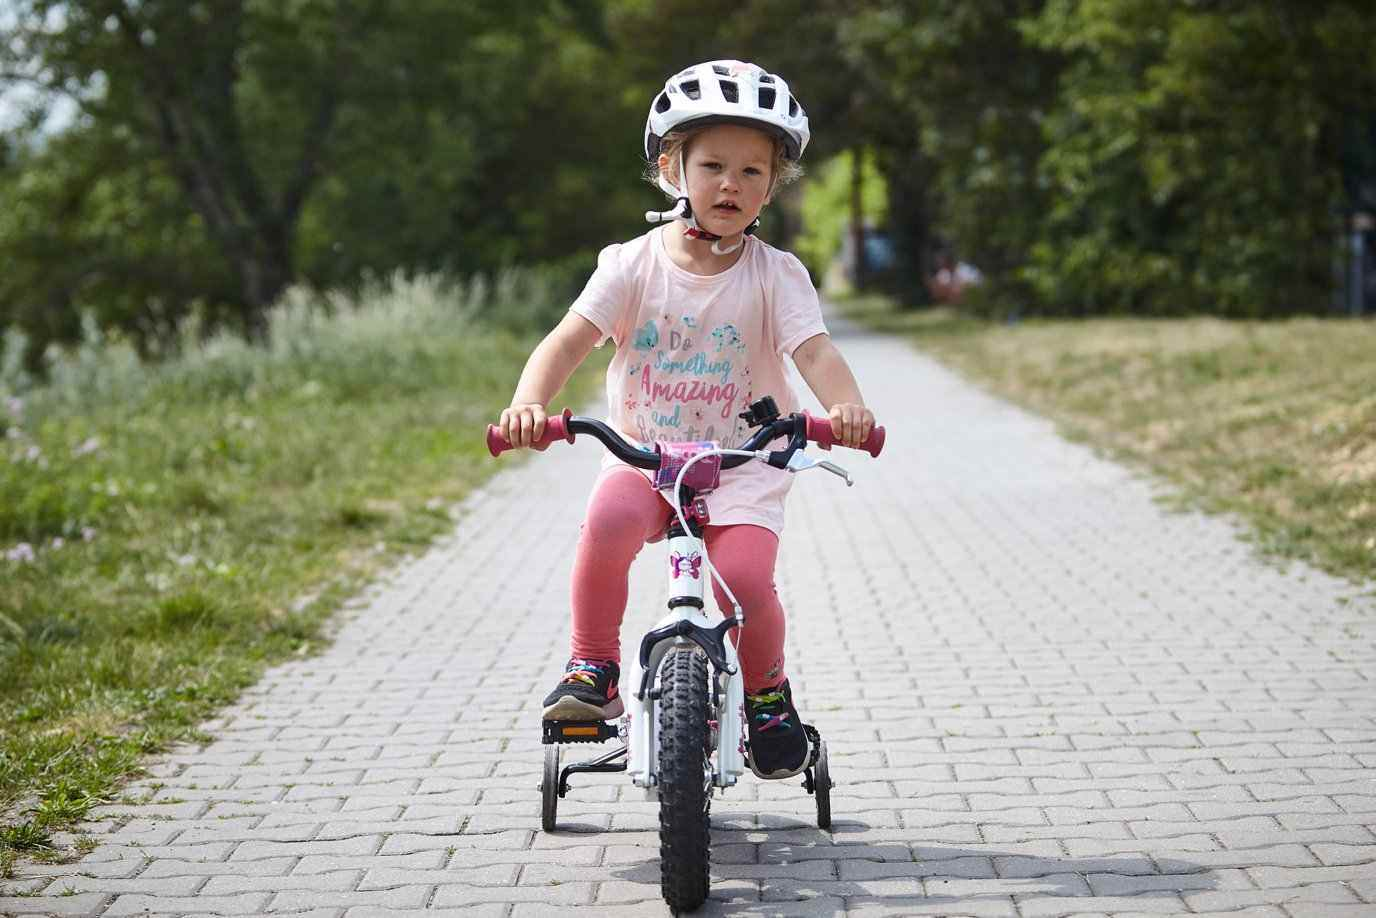 montar-en-bici-nina-aprender-como